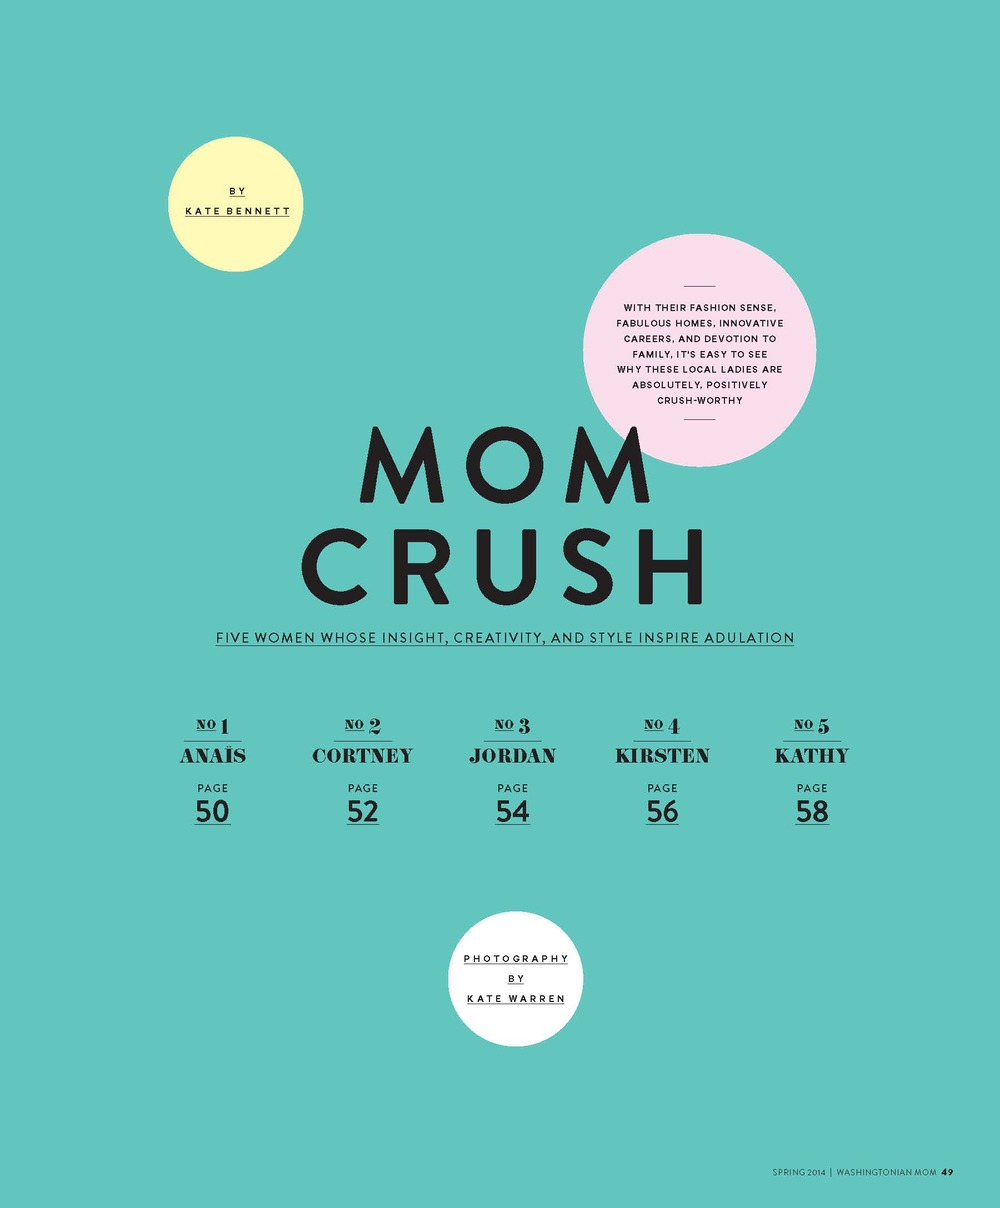 MomCrushRd3cSpring2014_Page_1.jpg